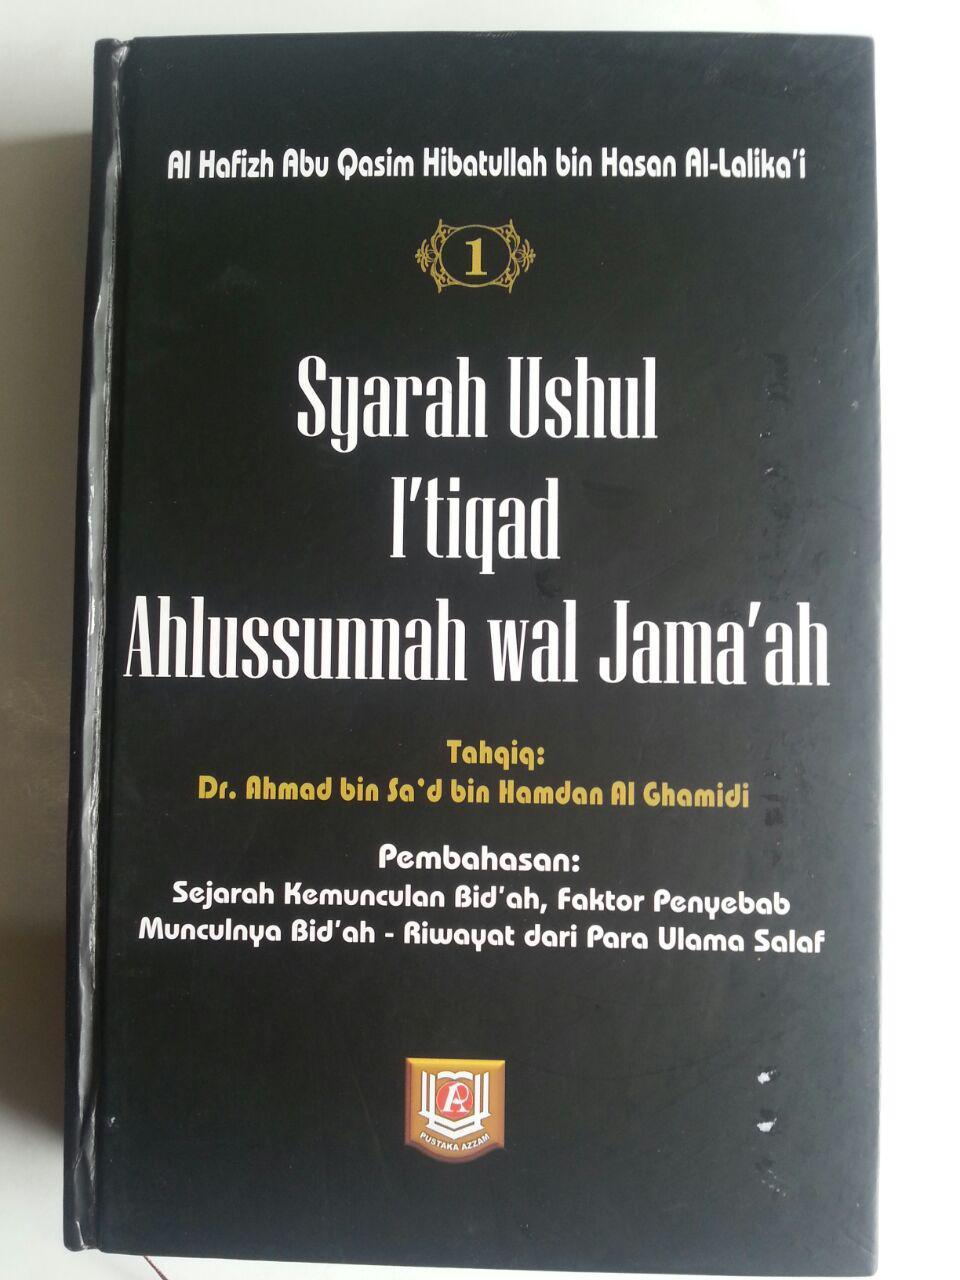 Buku Syarah Ushul I'tiqad Ahlussunnah Wal Jama'ah Set 8 Jilid 1 cover 2